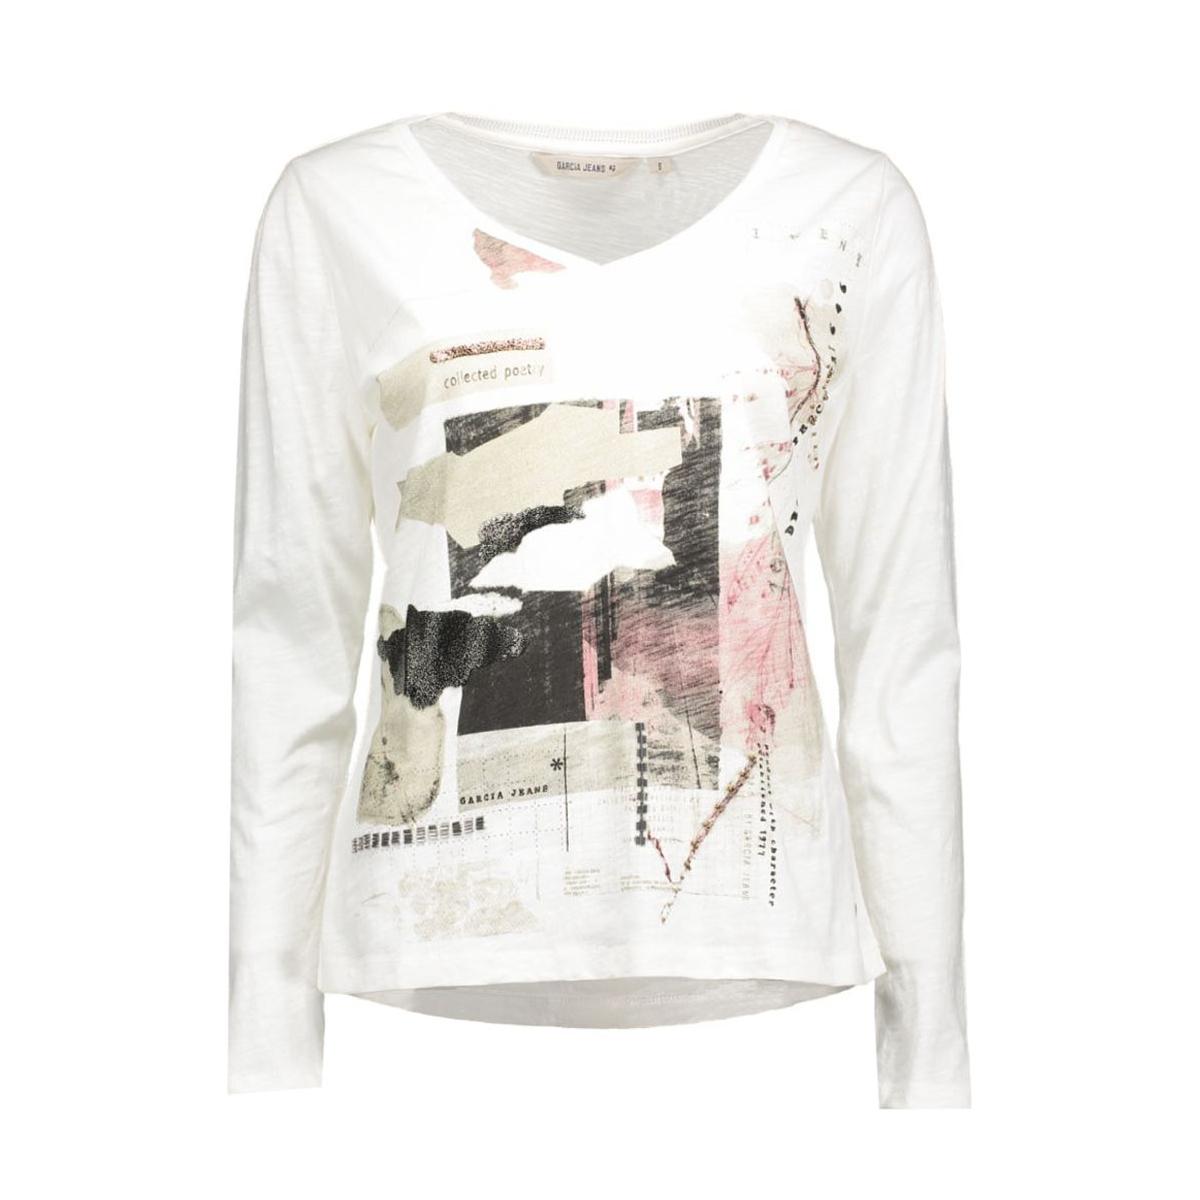 t60217 garcia t-shirt 27 winter white